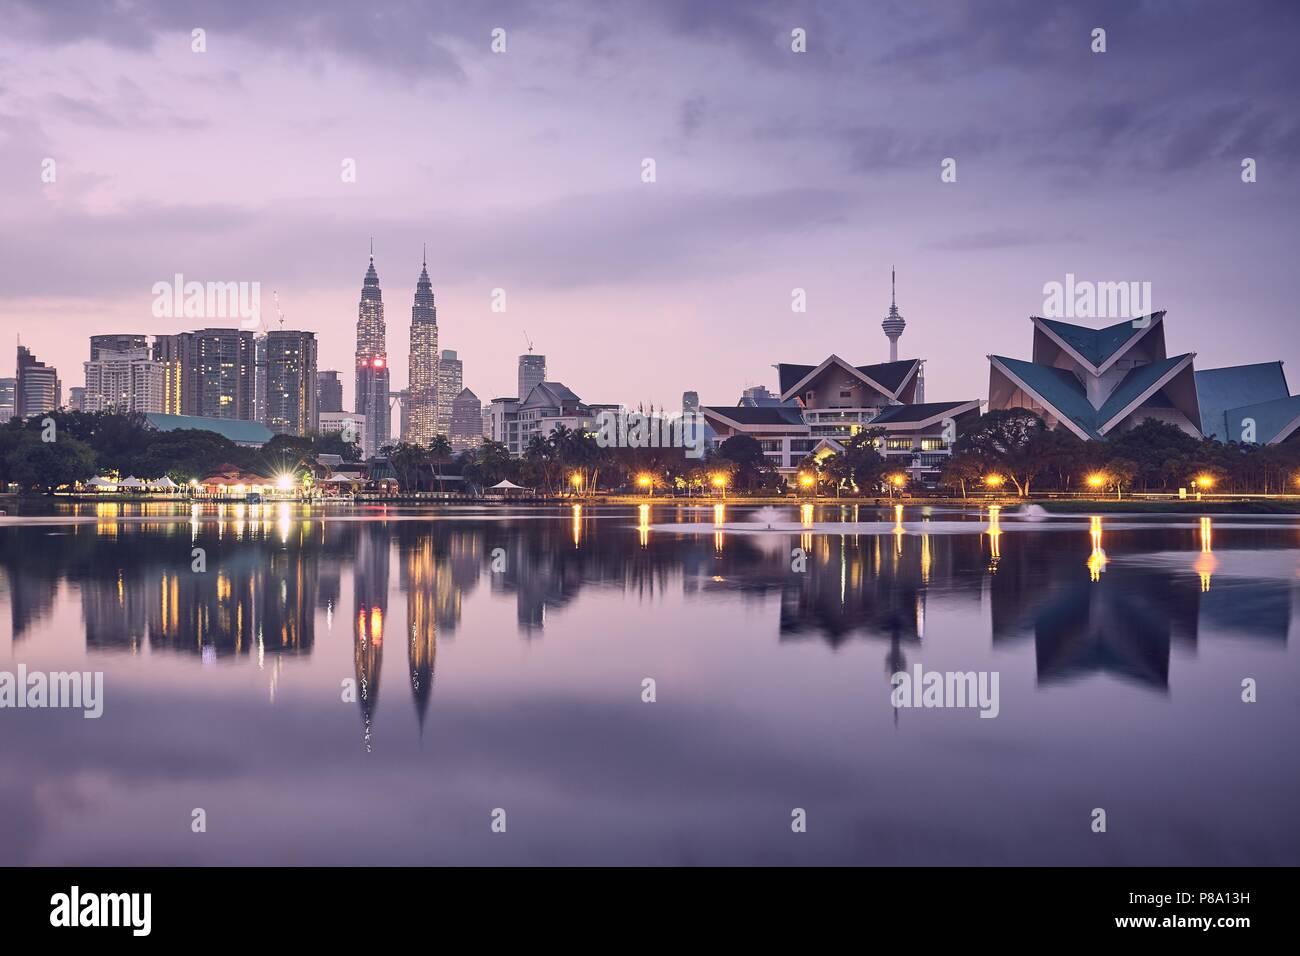 Moody Sonnenaufgang in Kuala Lumpur in Malaysia. Reflexion der Städtischen Skyline in den See. Stockbild